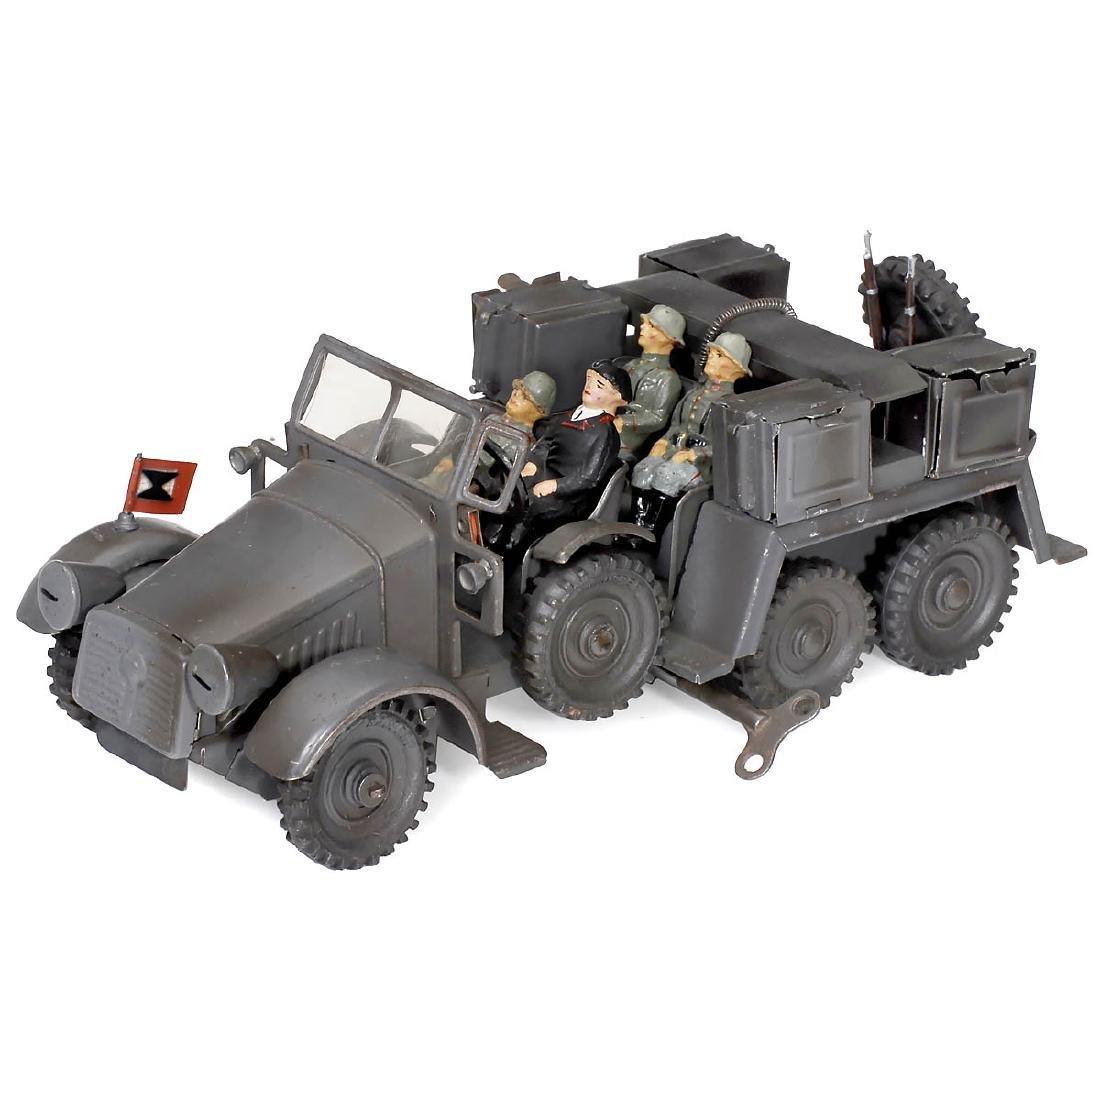 Hausser (Elastolin) WWII Krupp-Protze Truck No. 730, c.